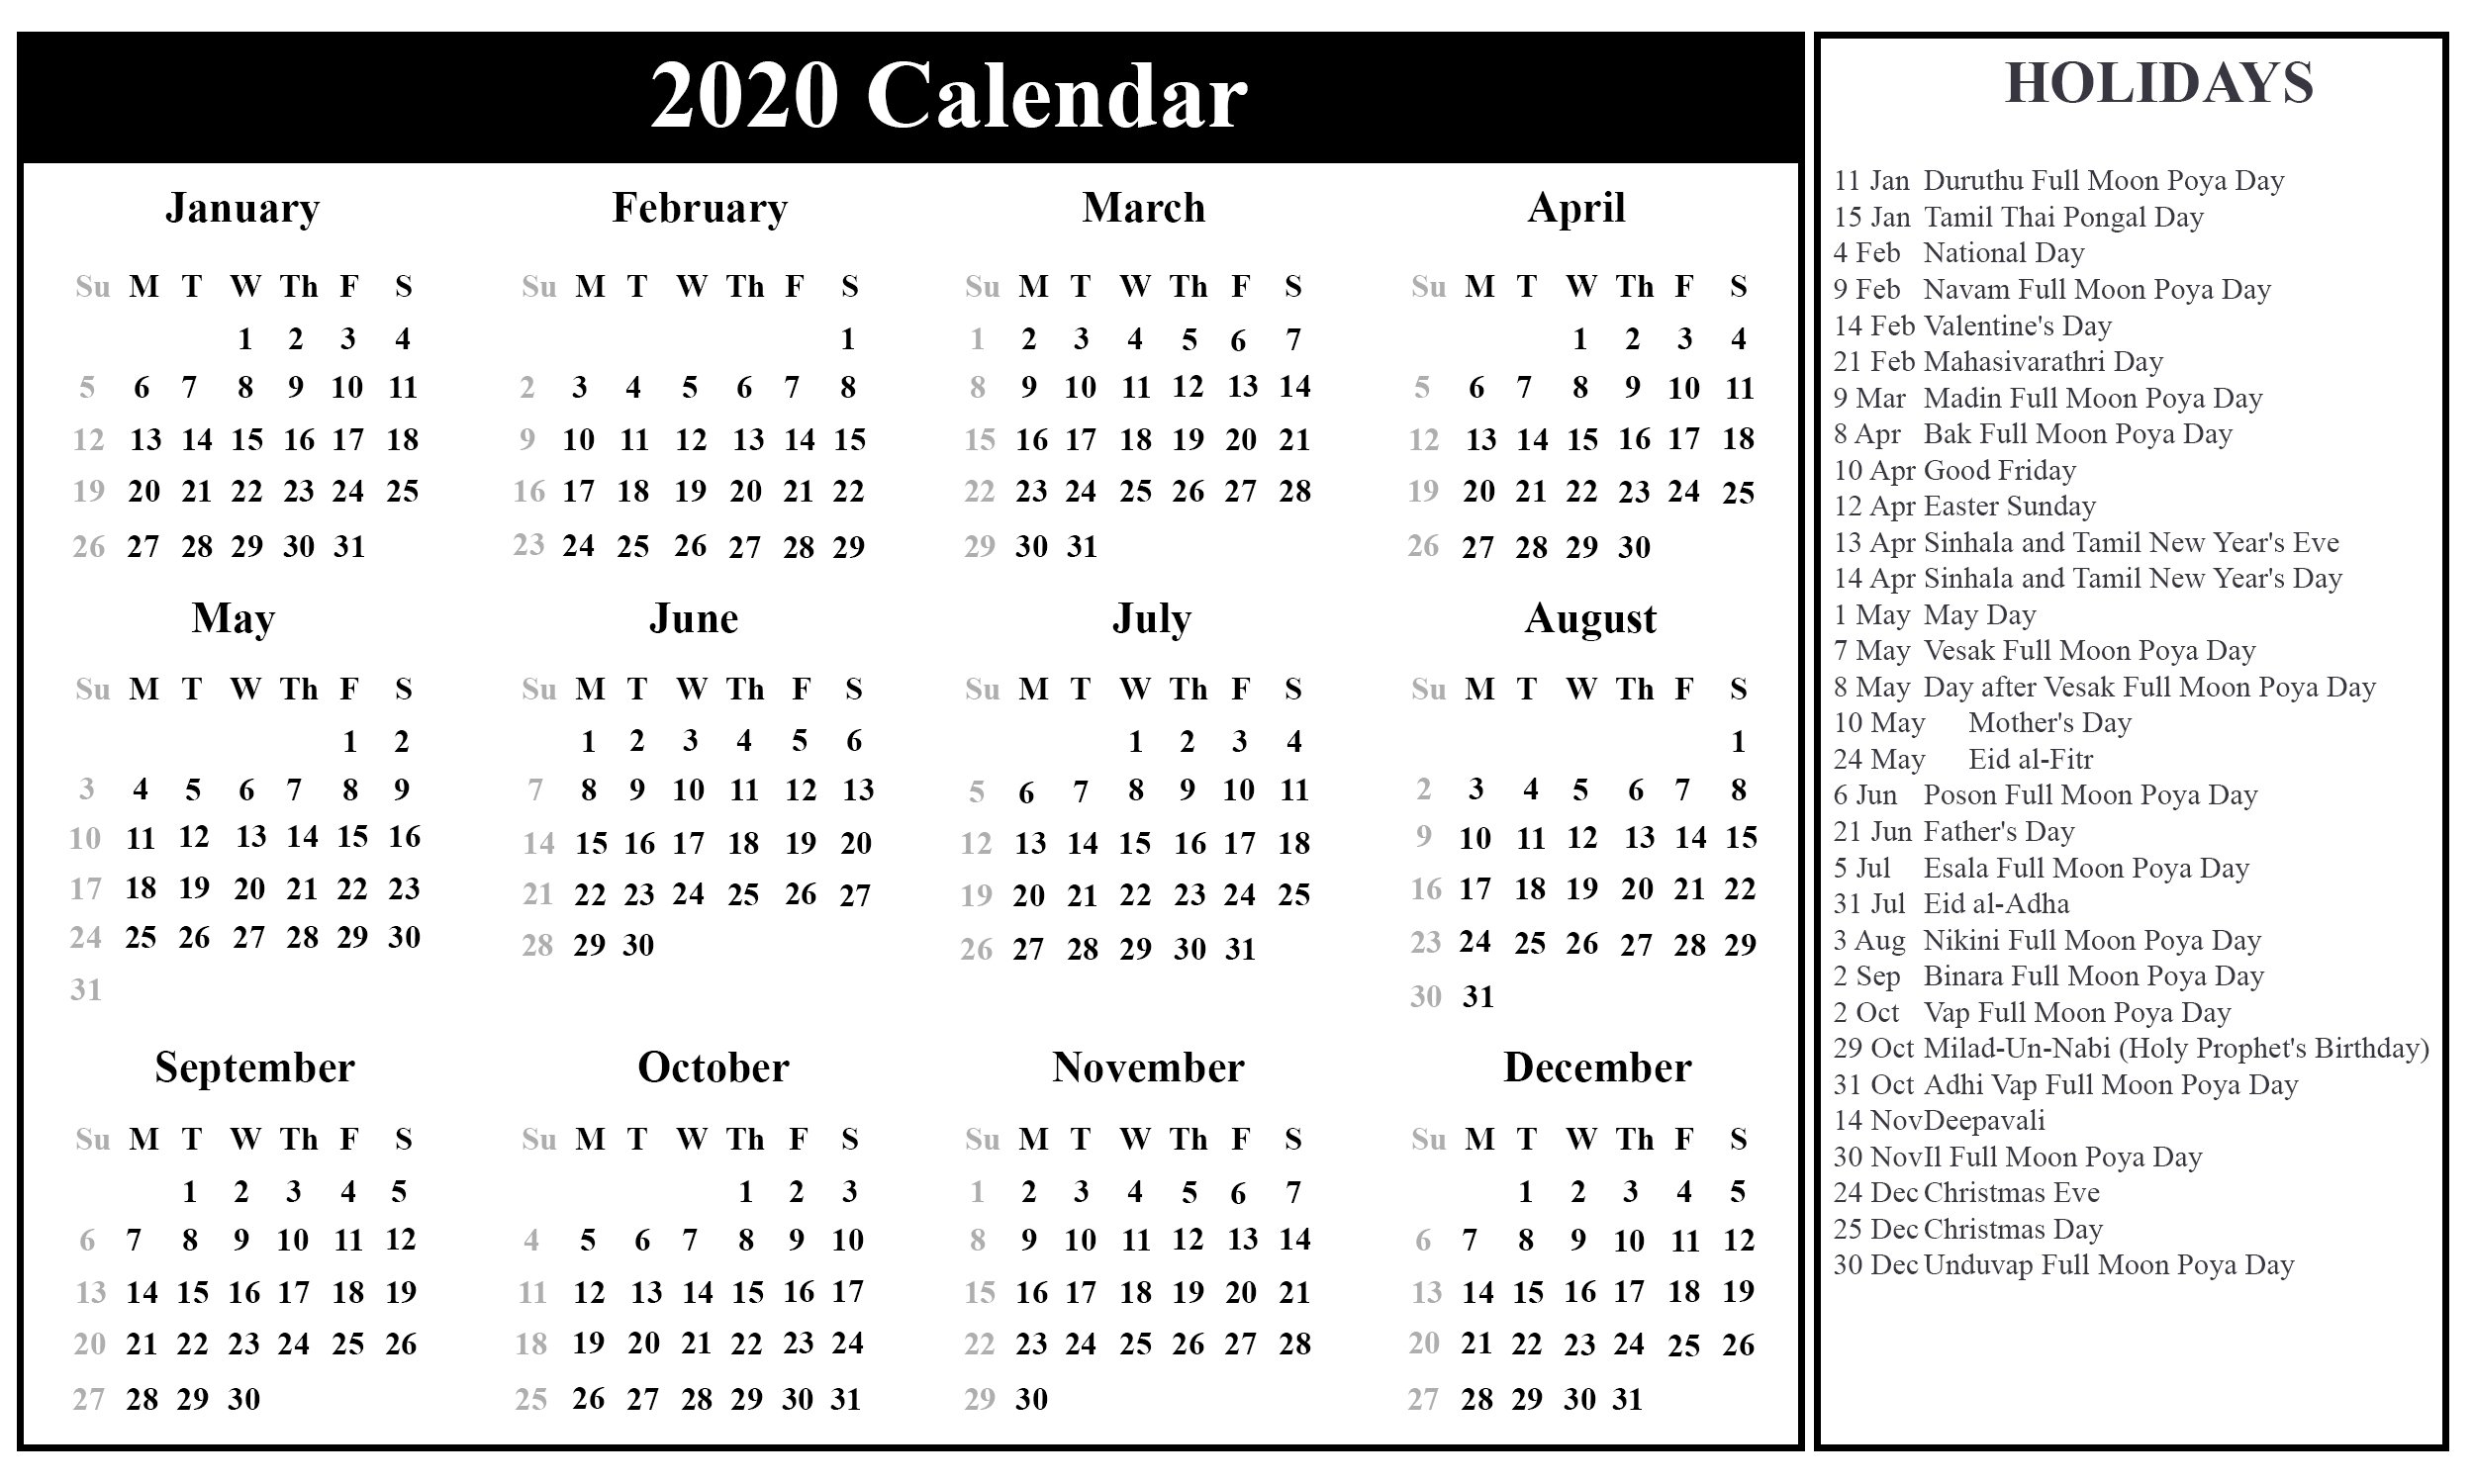 Free Printable Sri Lanka Calendar 2020 With Holidays In Pdf Calendar Month In Sinhala